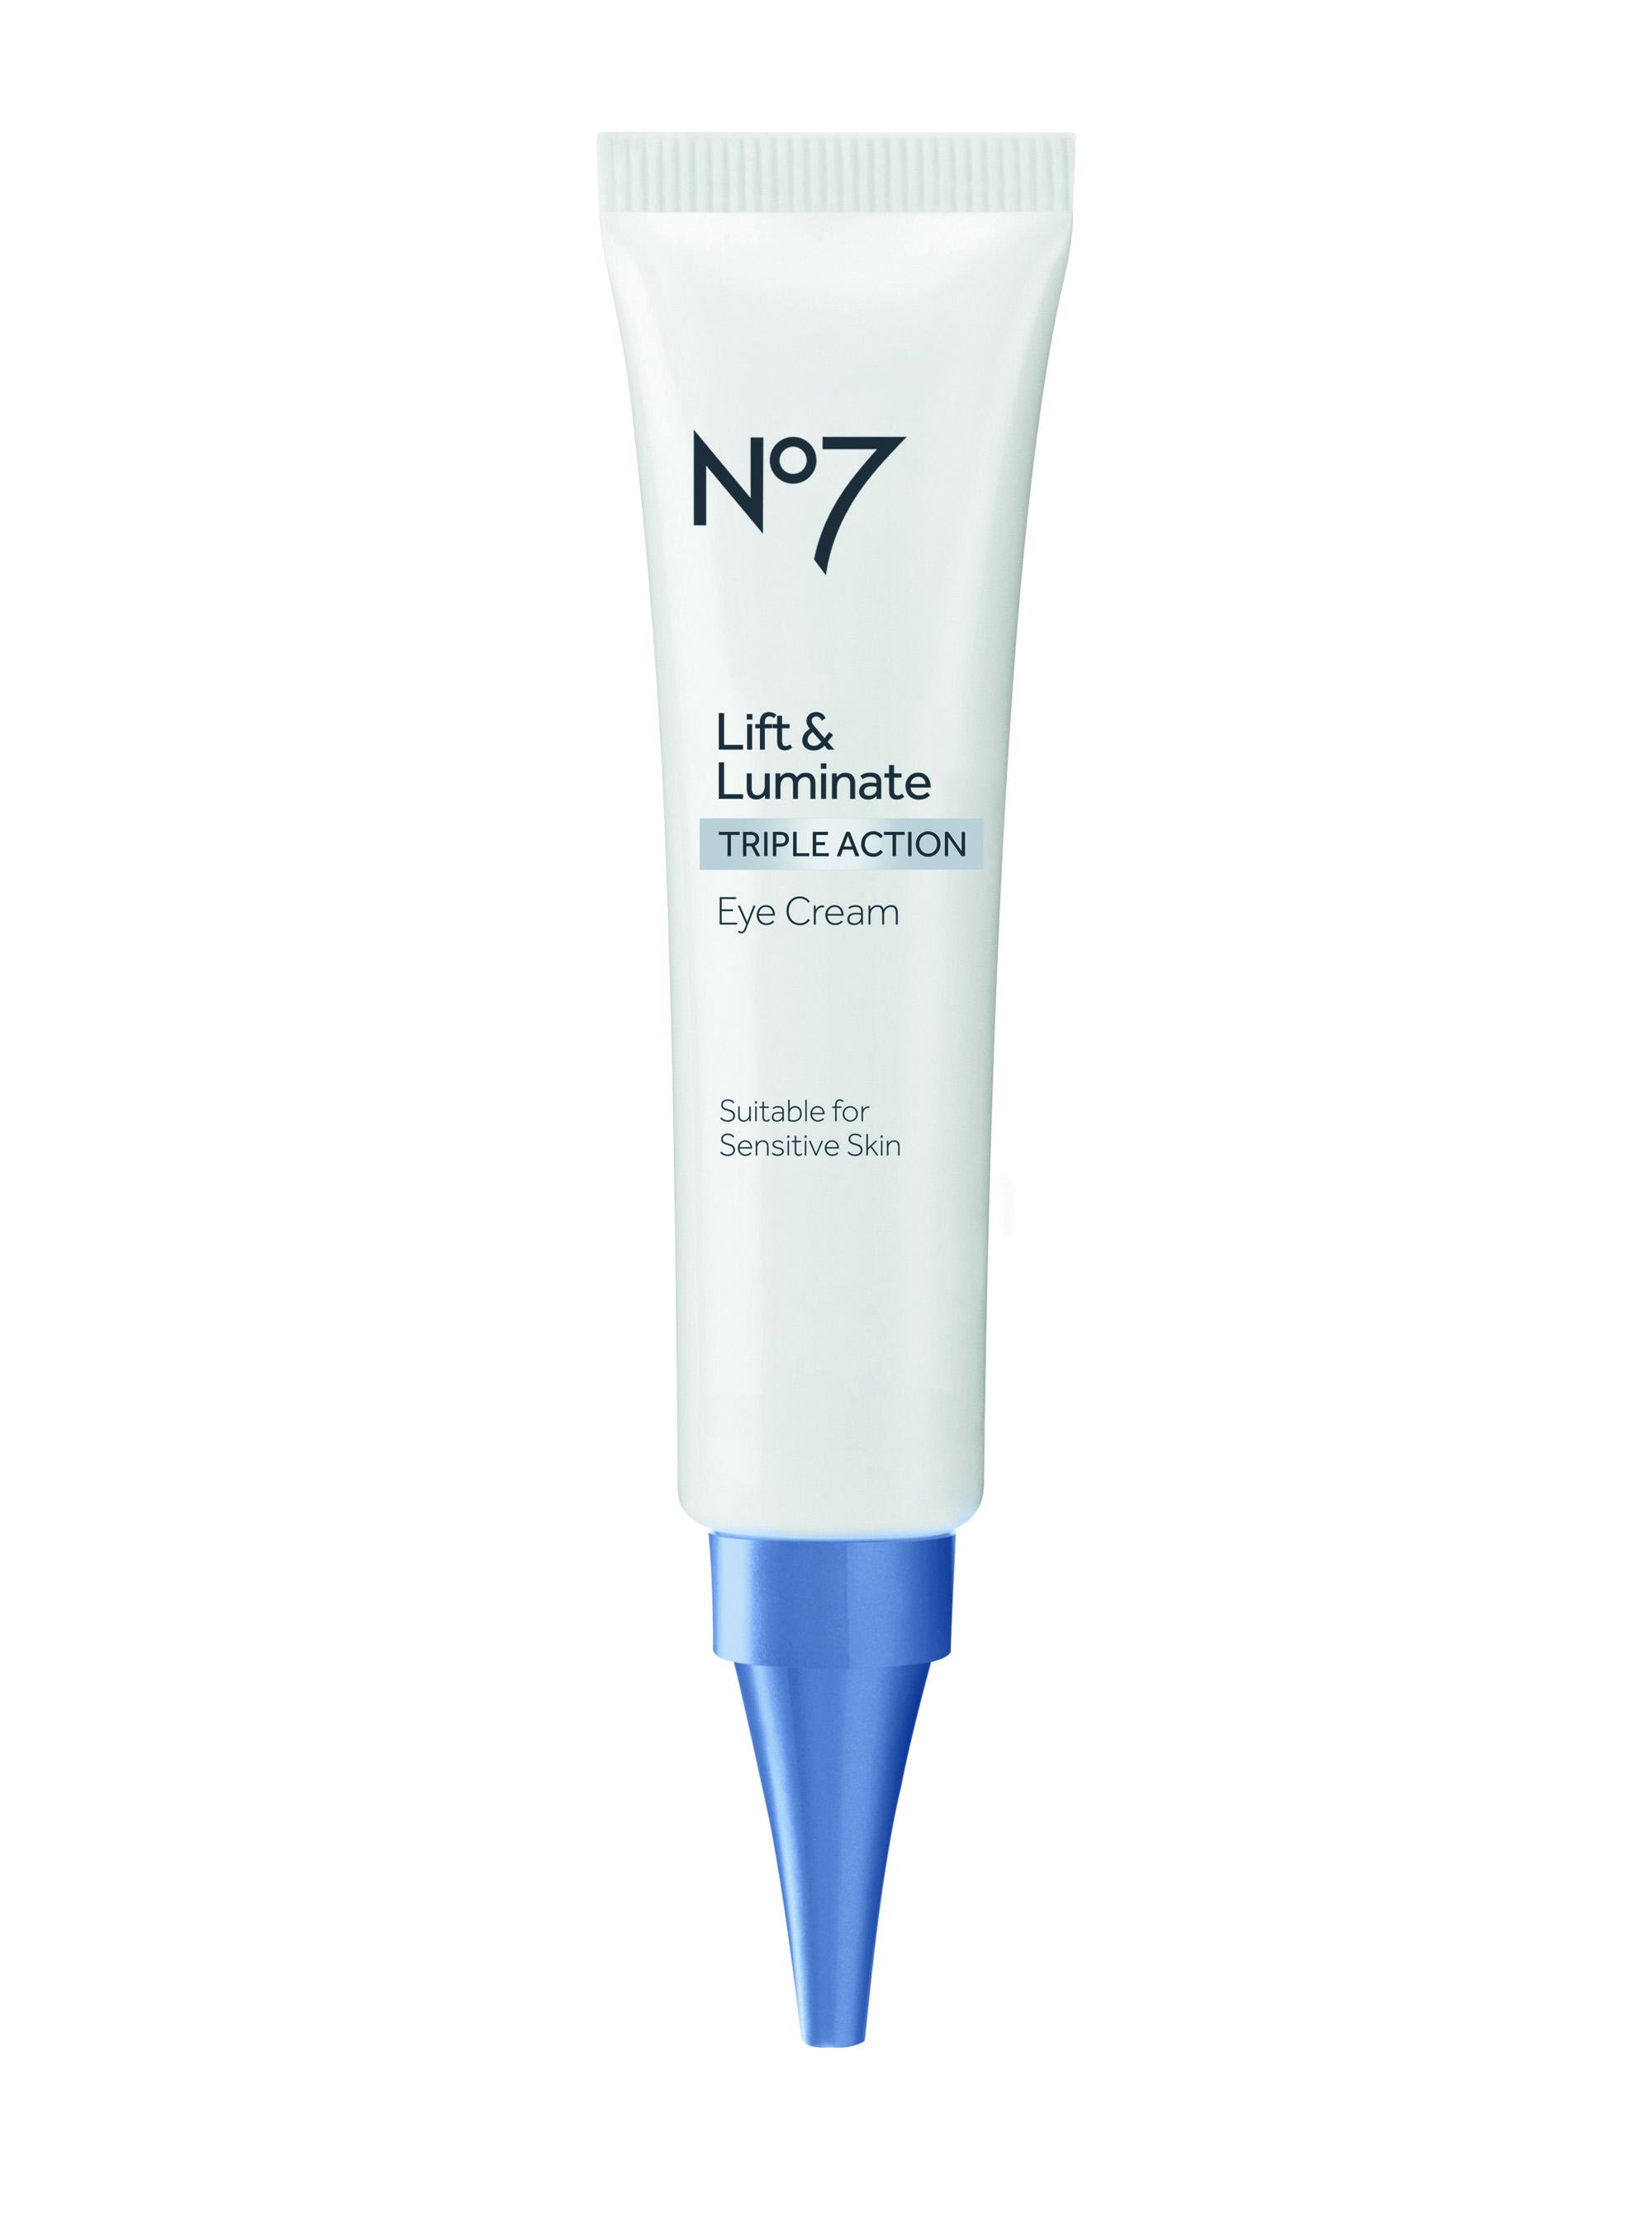 No7 eye makeup